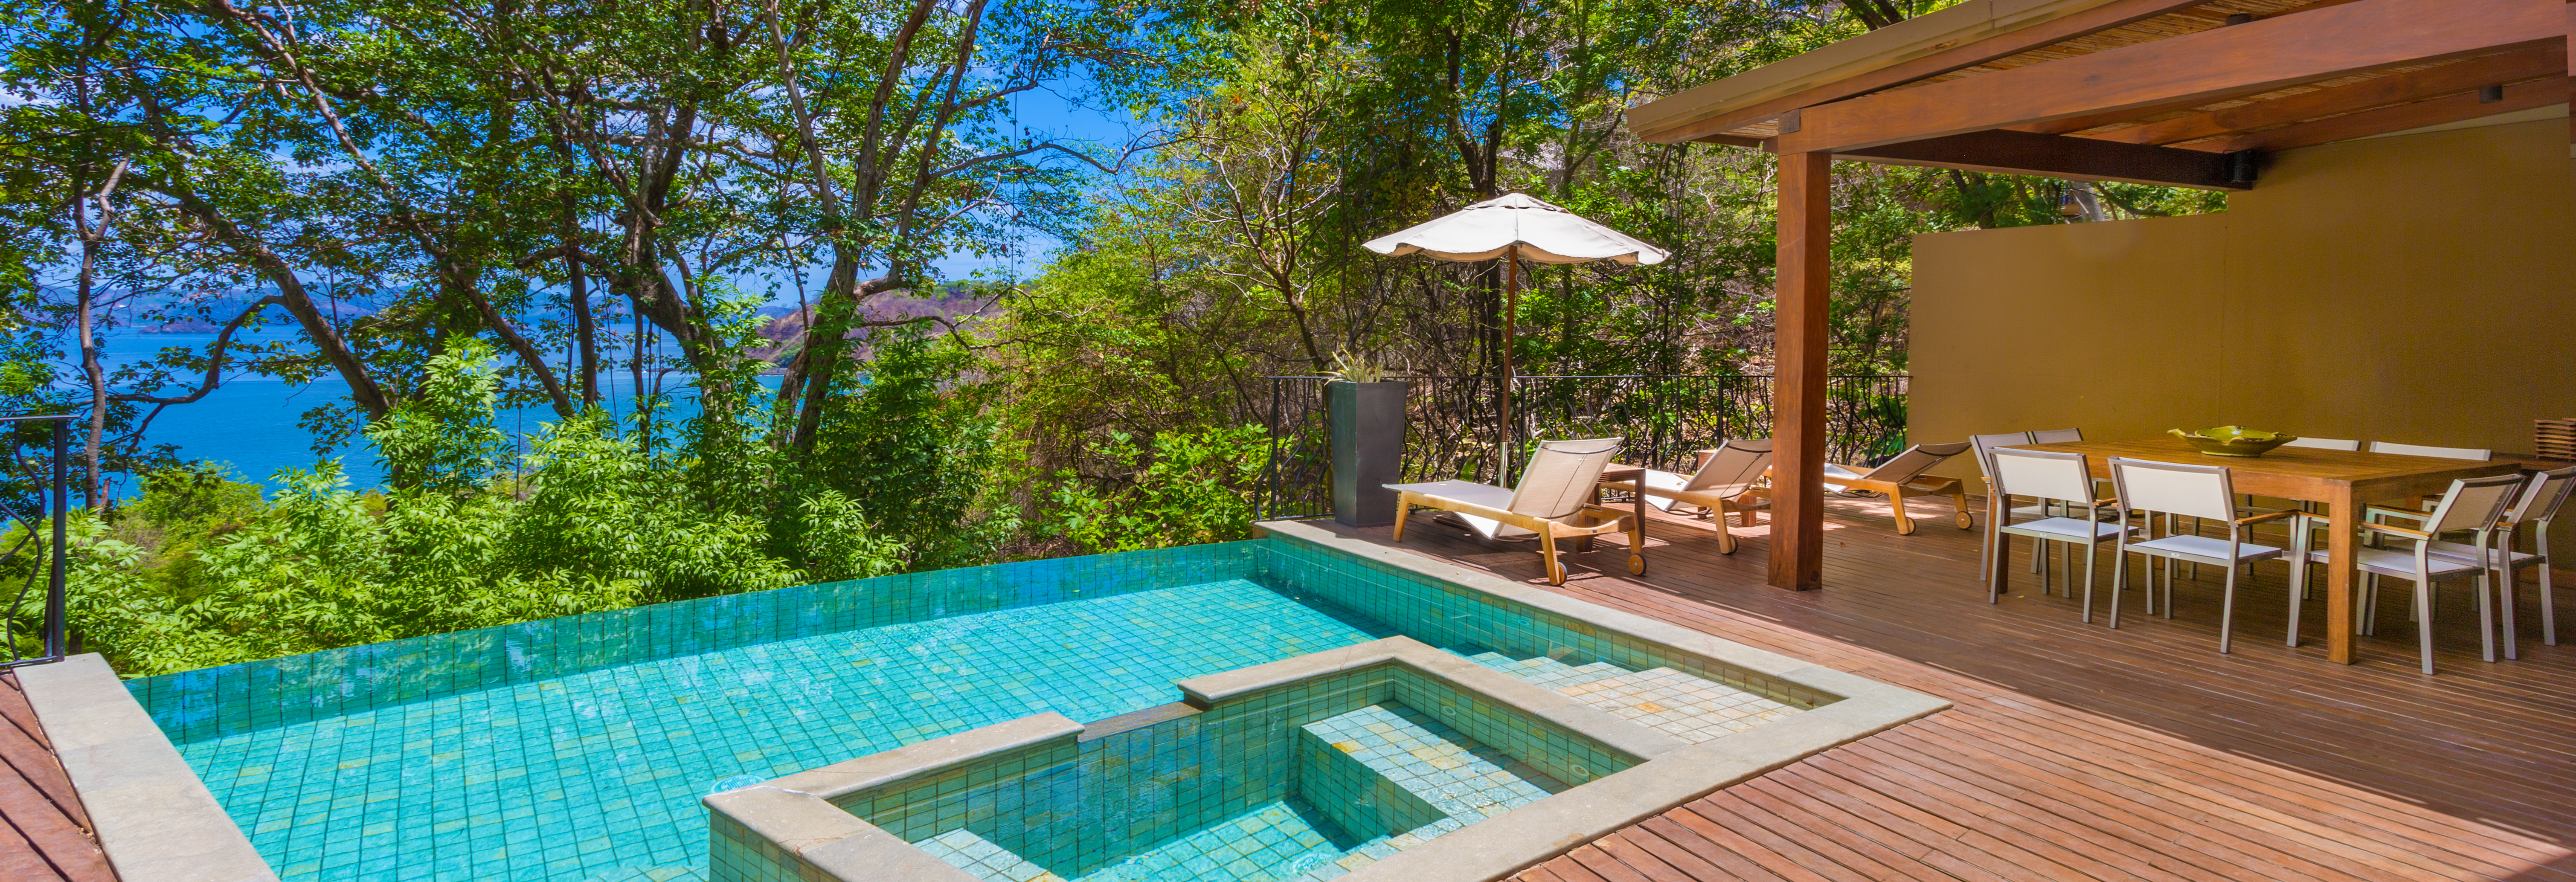 peninsula papagayo costa rica inspirato luxury vacation residences